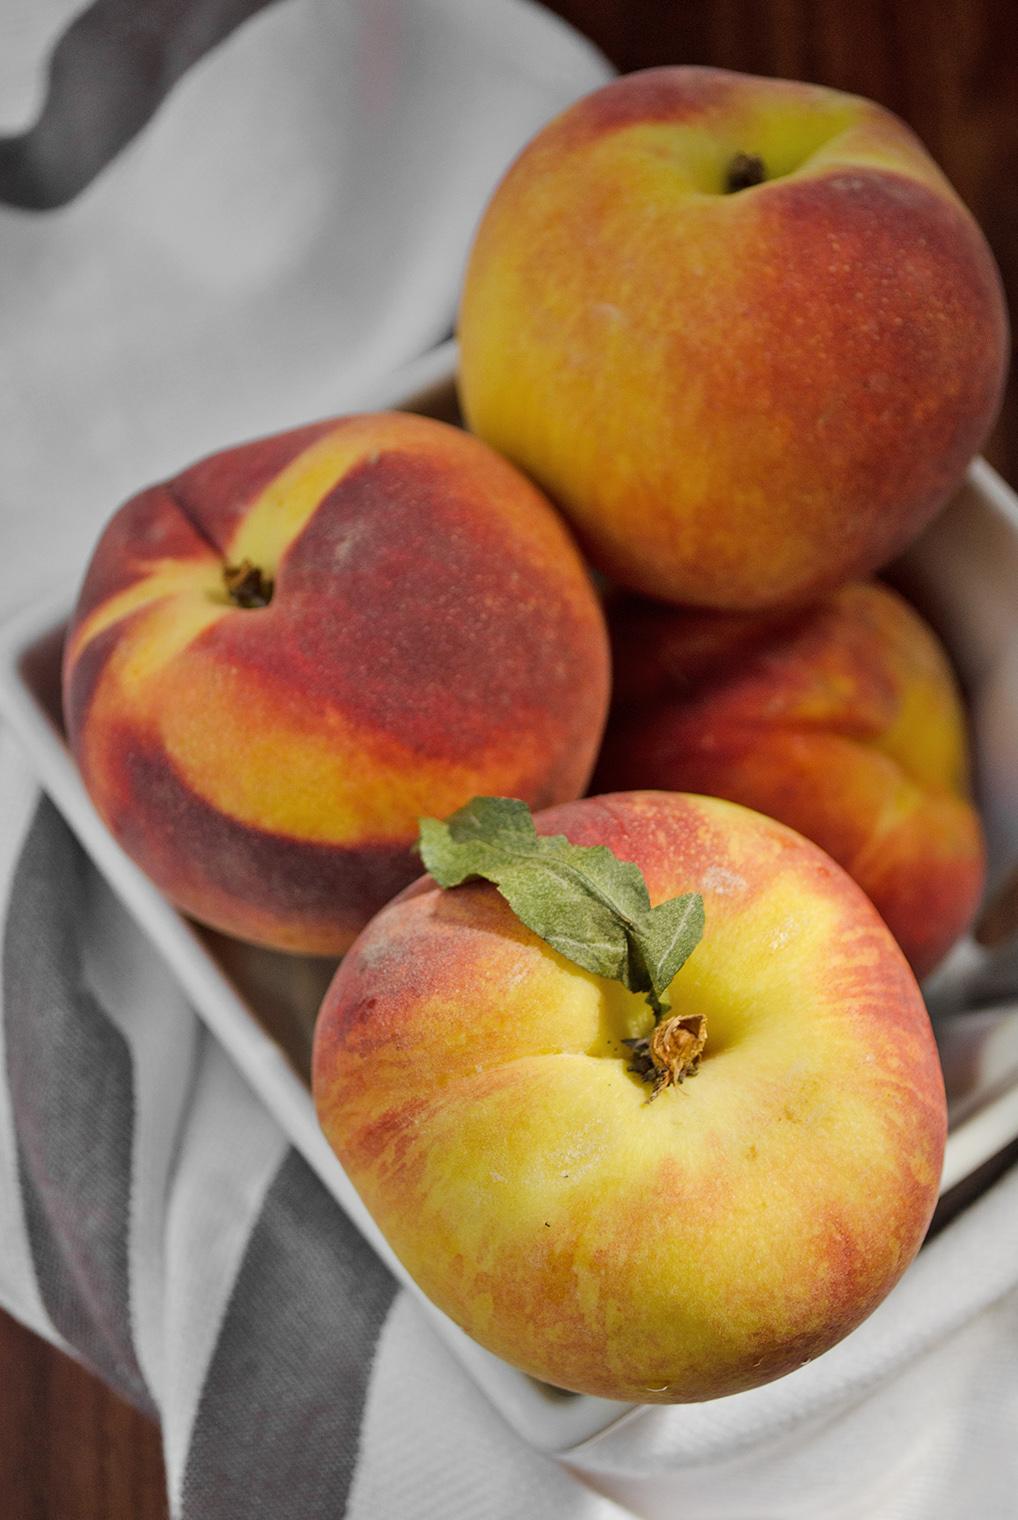 Farm Fresh Peach Jam 8_acookscanvas-copyright2012-2019_510.2